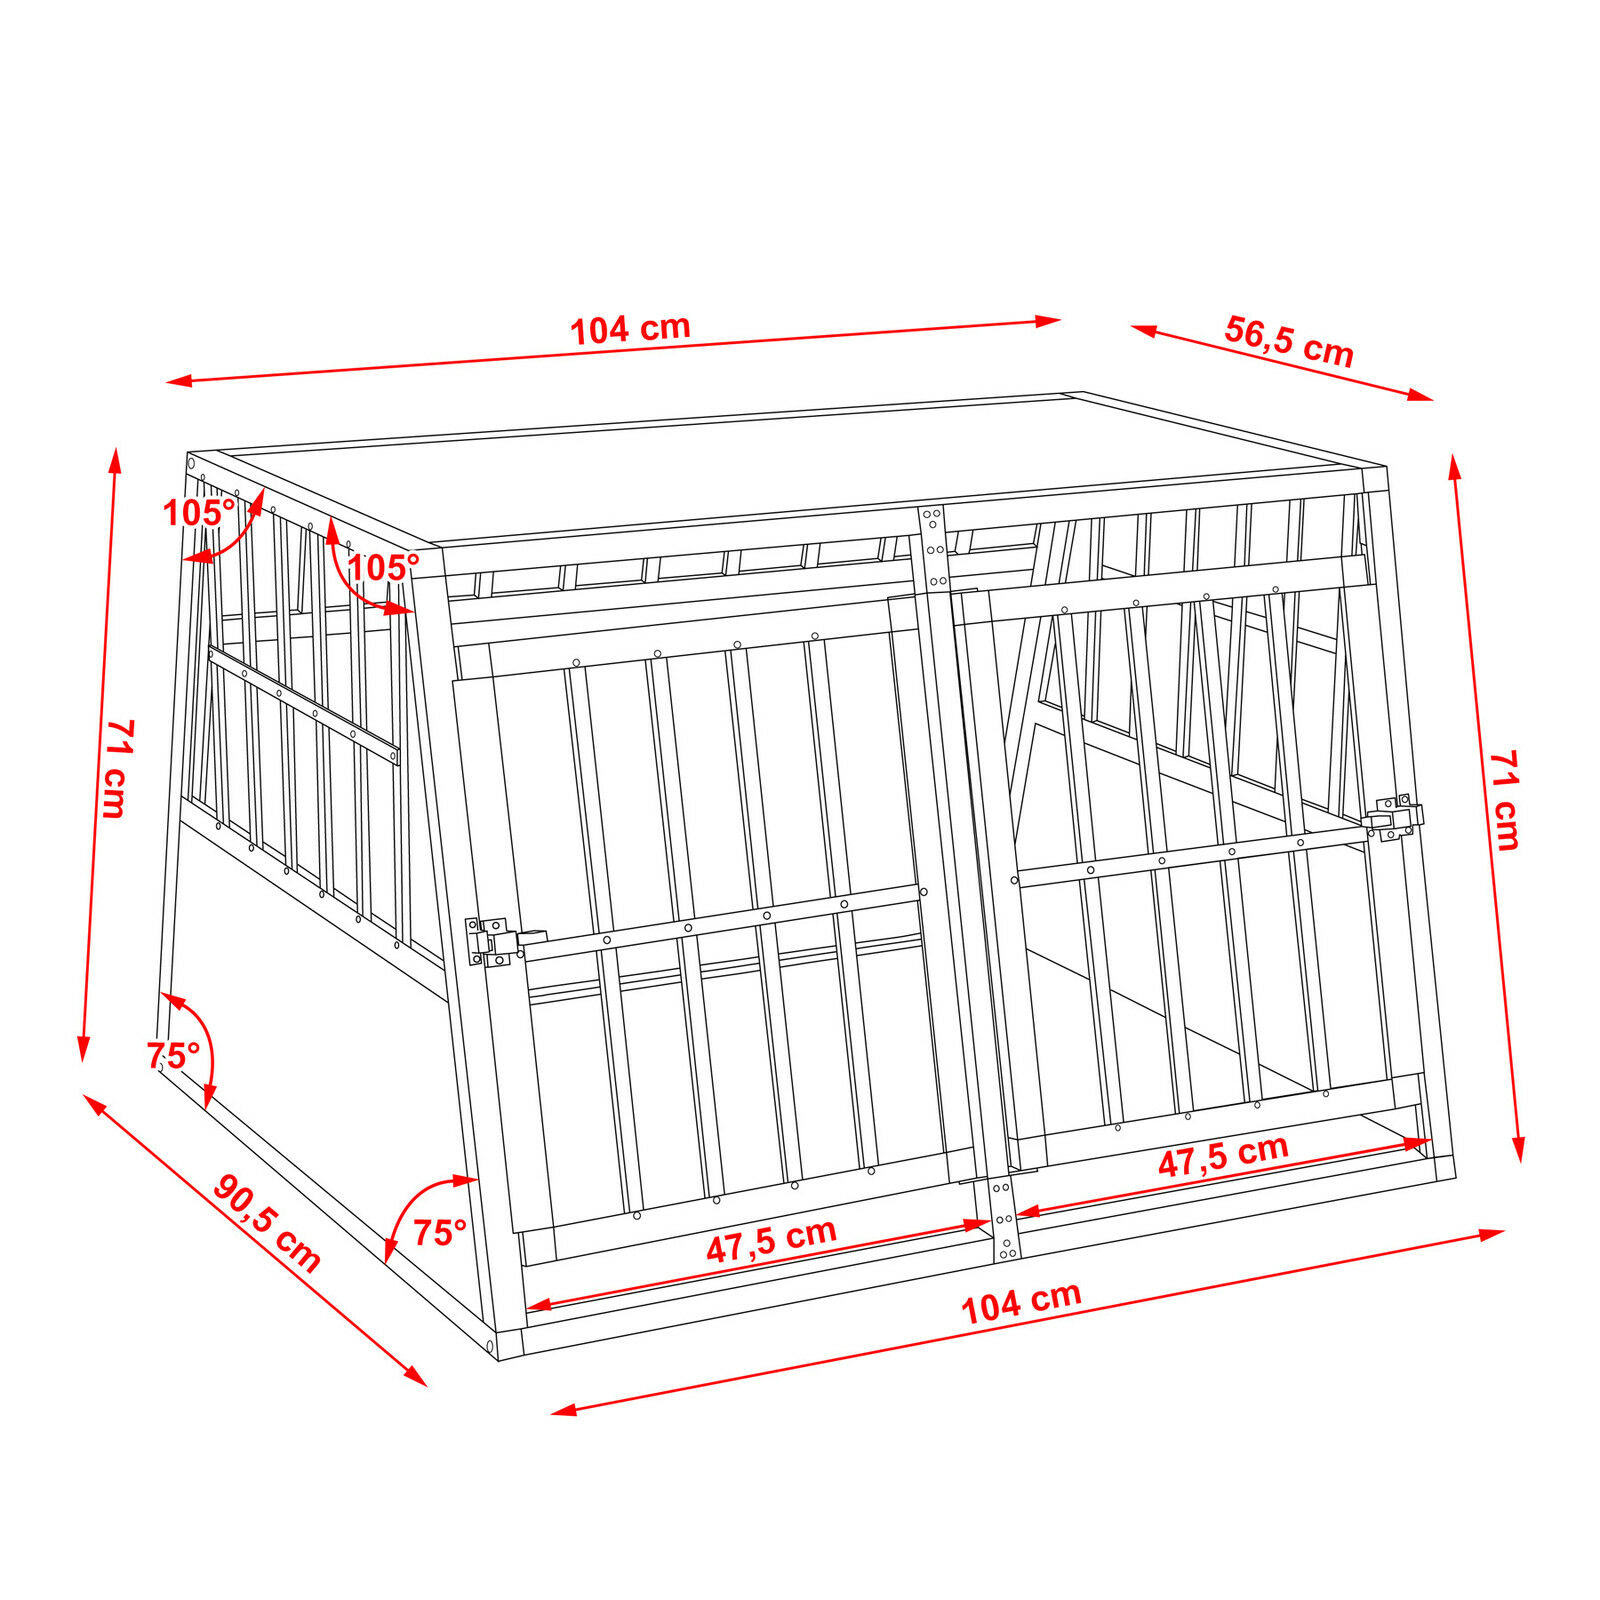 XXL Transportín doble con con con parosso divisoria para perros aluminio trapezoidal 7a6a59